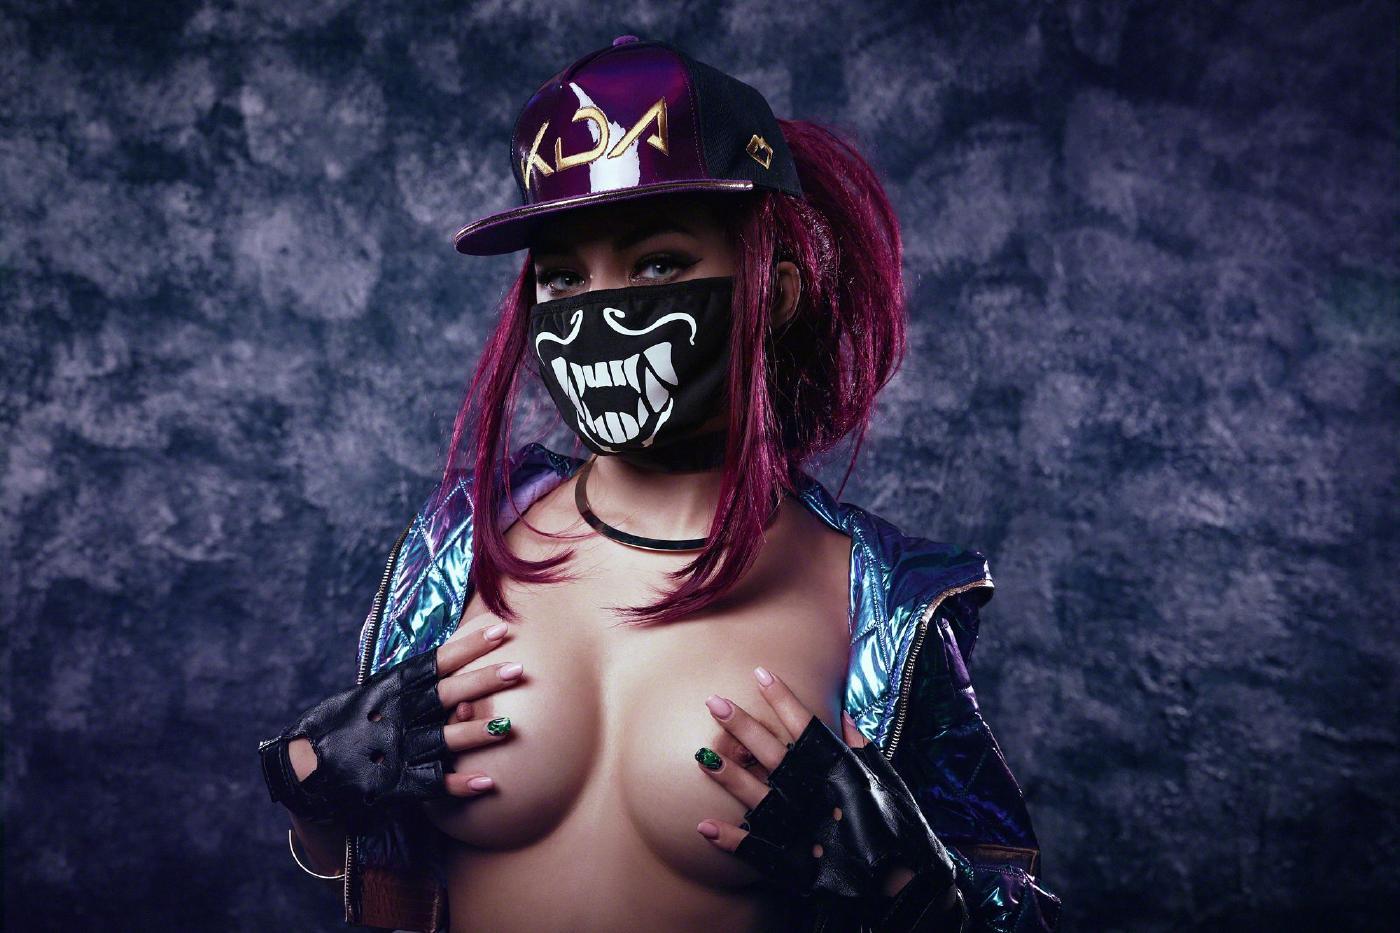 Kalinka Fox Nude Akali Cosplay Leaked 22